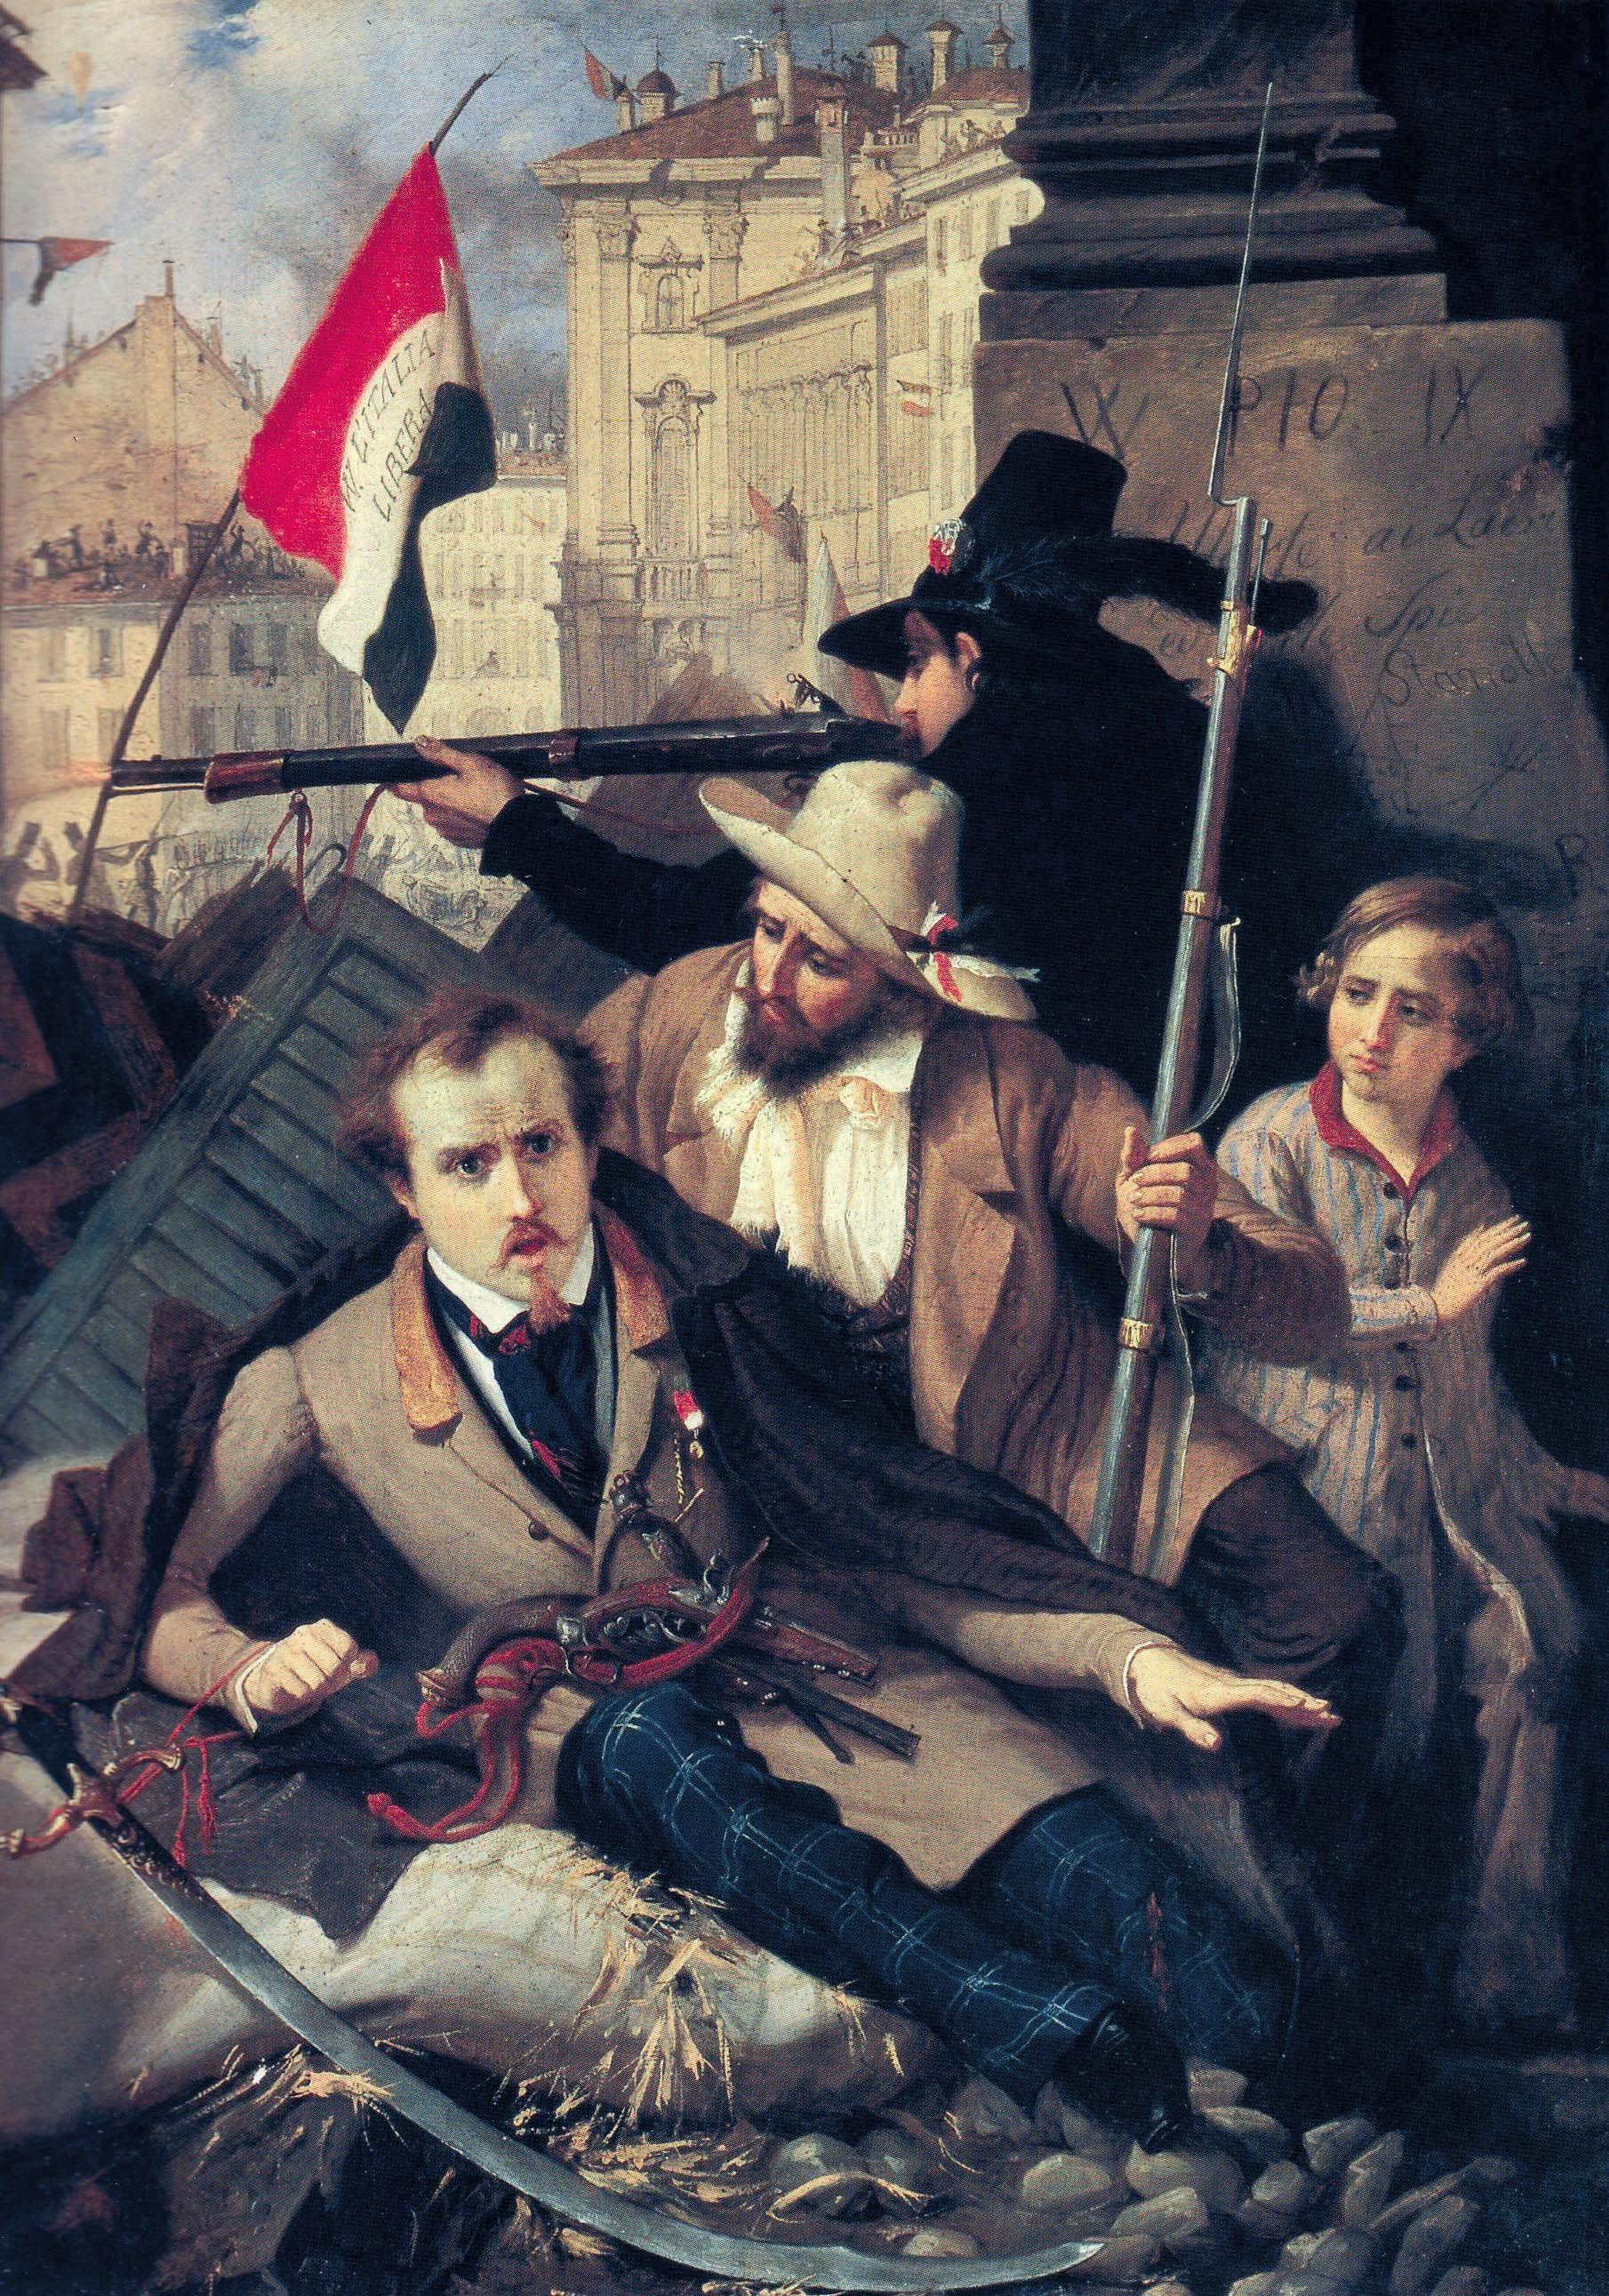 Baldassare Verazzi, Les Cinq Journées de Milan